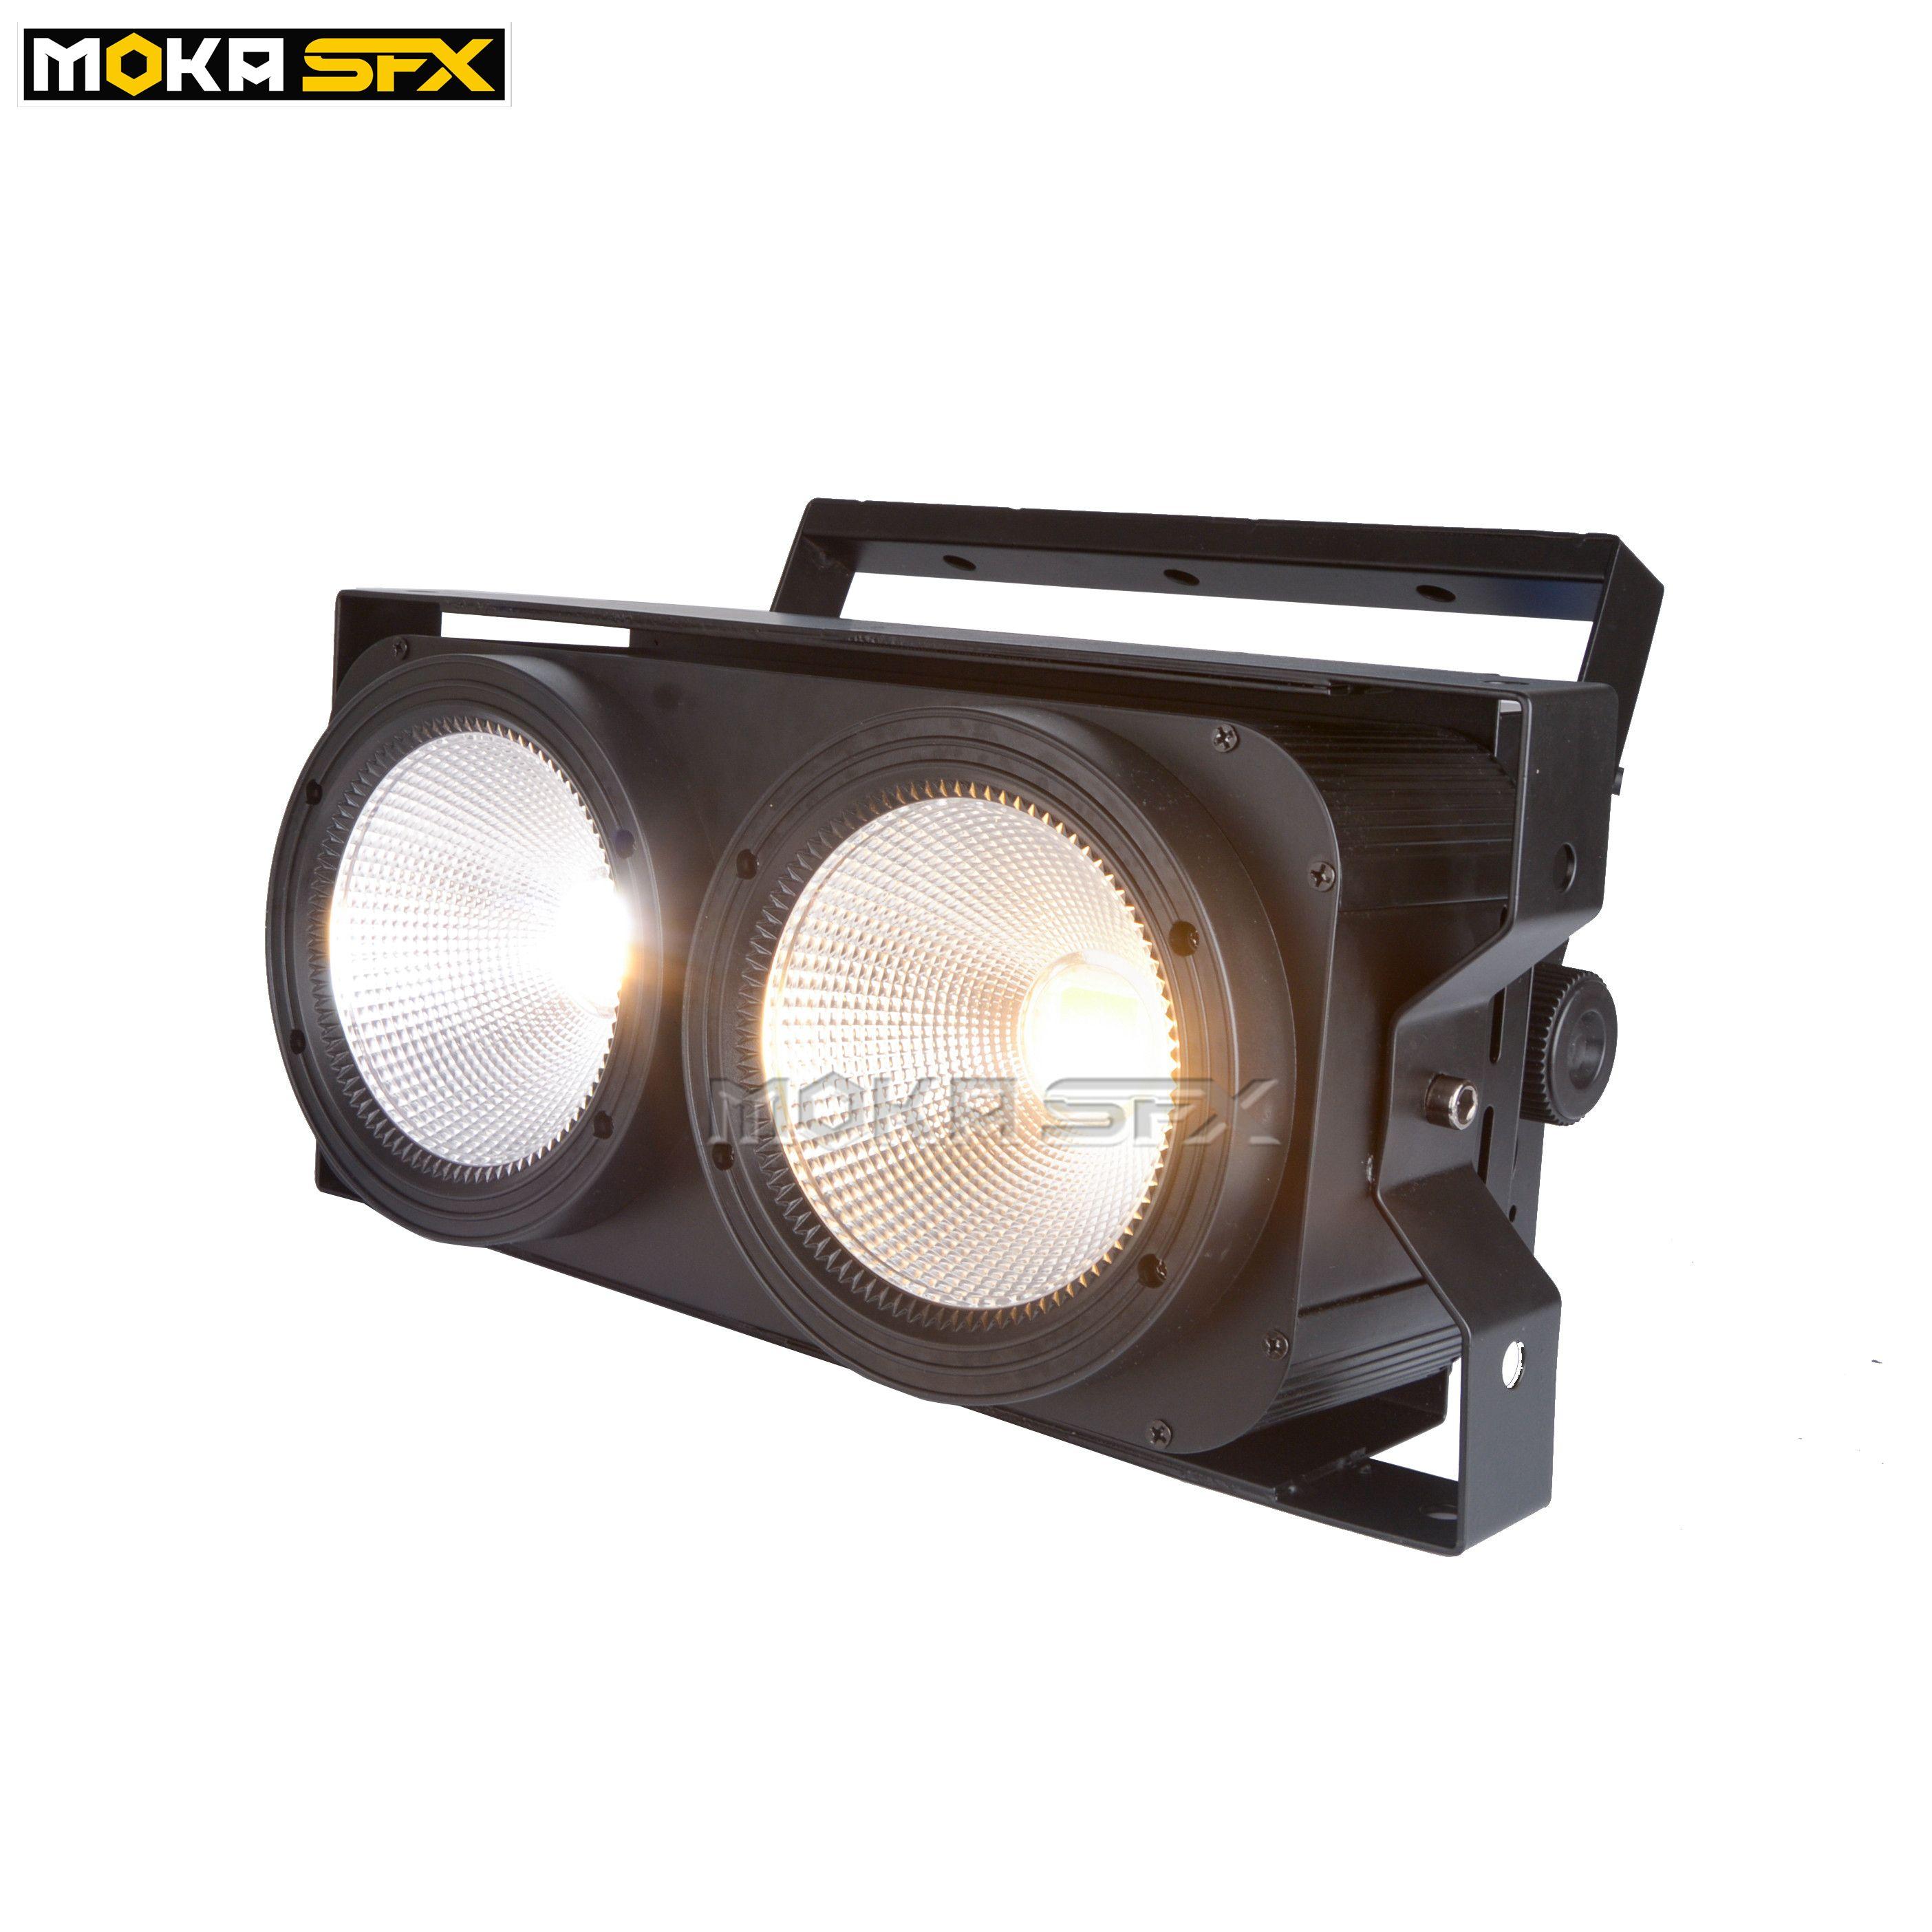 2 * 100W الصمام COB ضوء DMX المرحلة إضاءة تأثير الصمام الخفيفة الاسمية كول الأبيض / الدافئة الابيض / 2IN1 الغمامة الجمهور